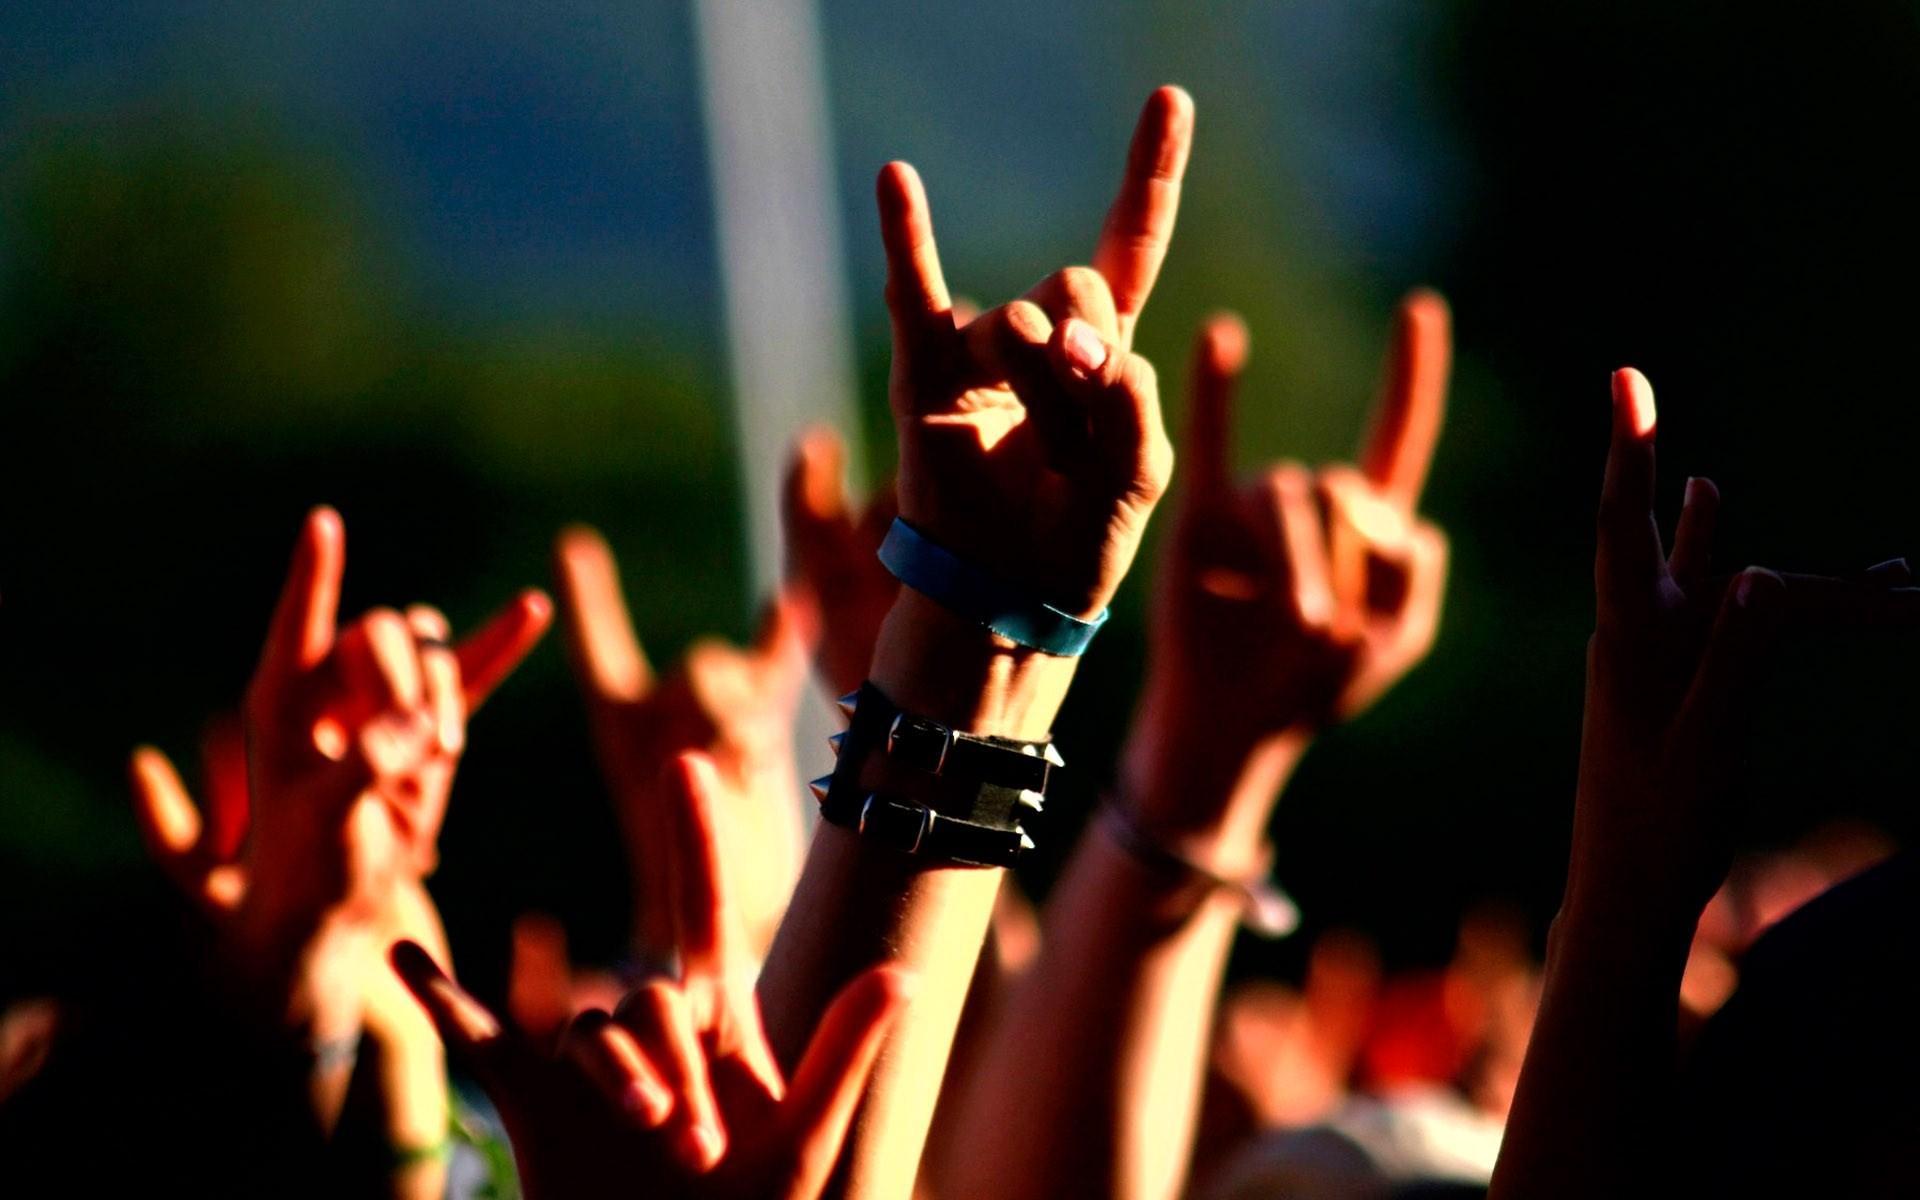 rock-music-wallpapers-1.jpg